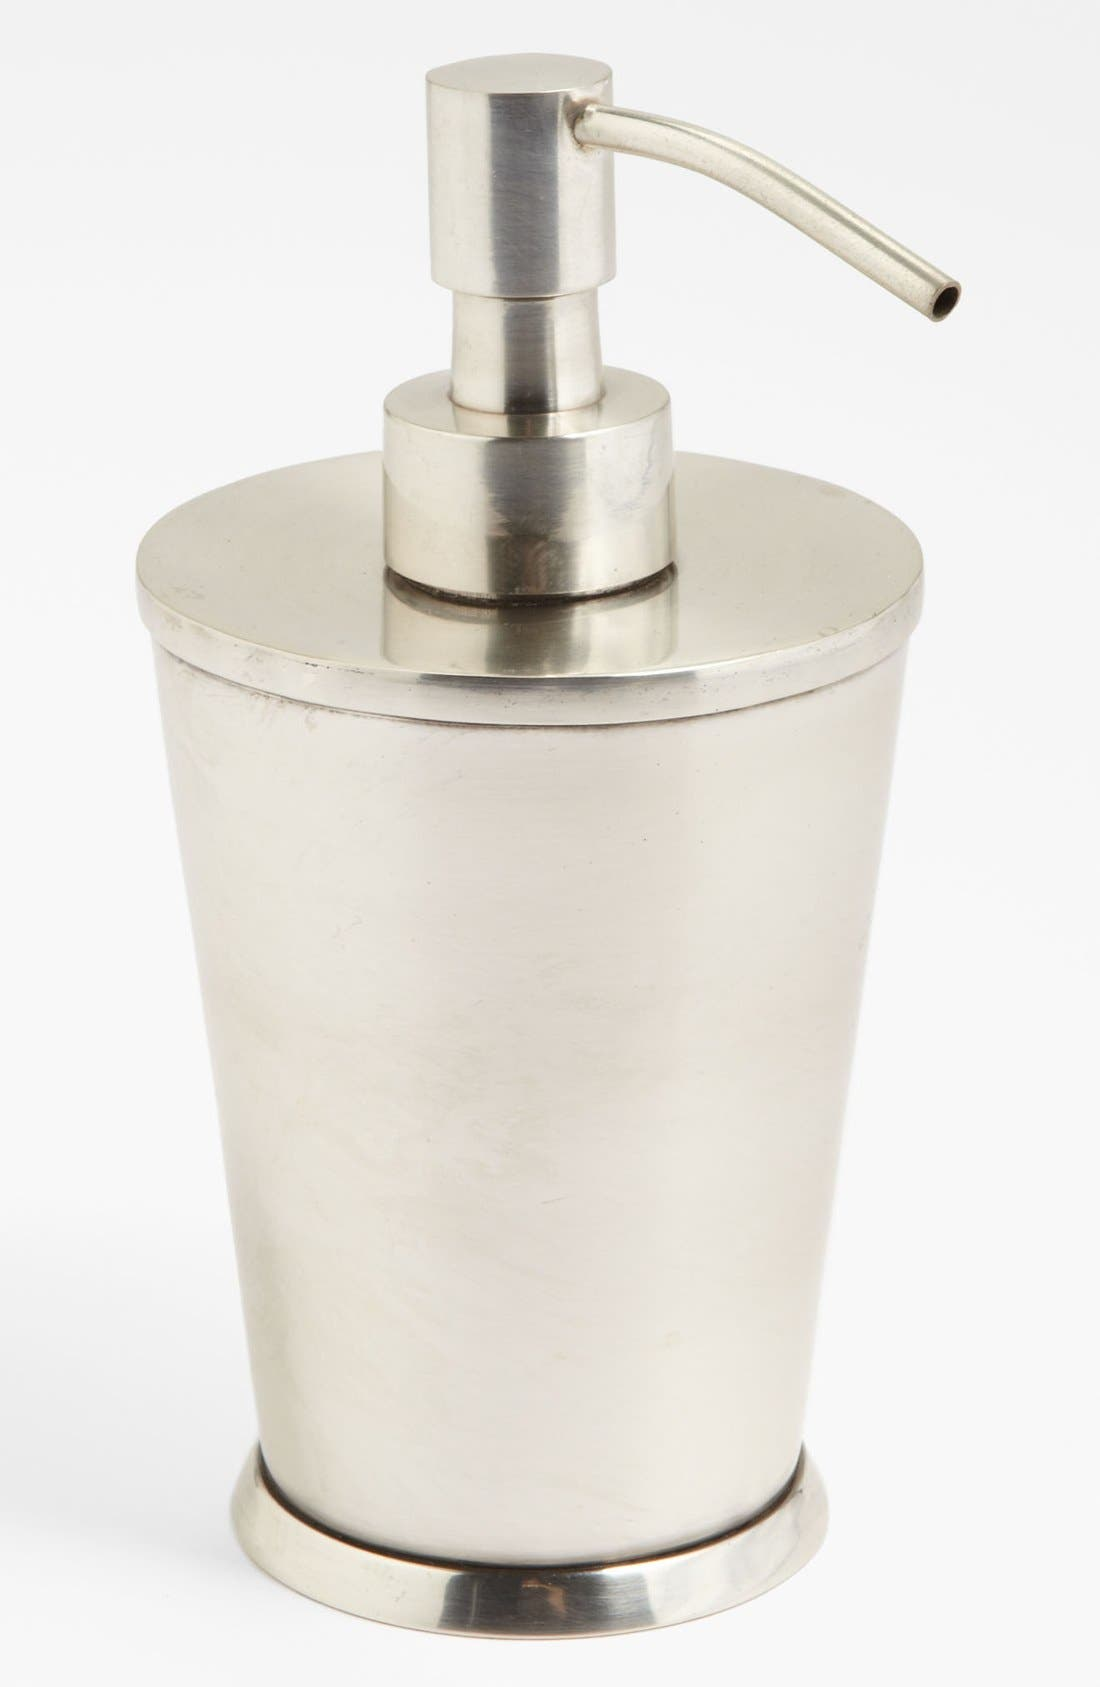 Waterworks Studio 'Wallingford' Soap Dispenser (Online Only)